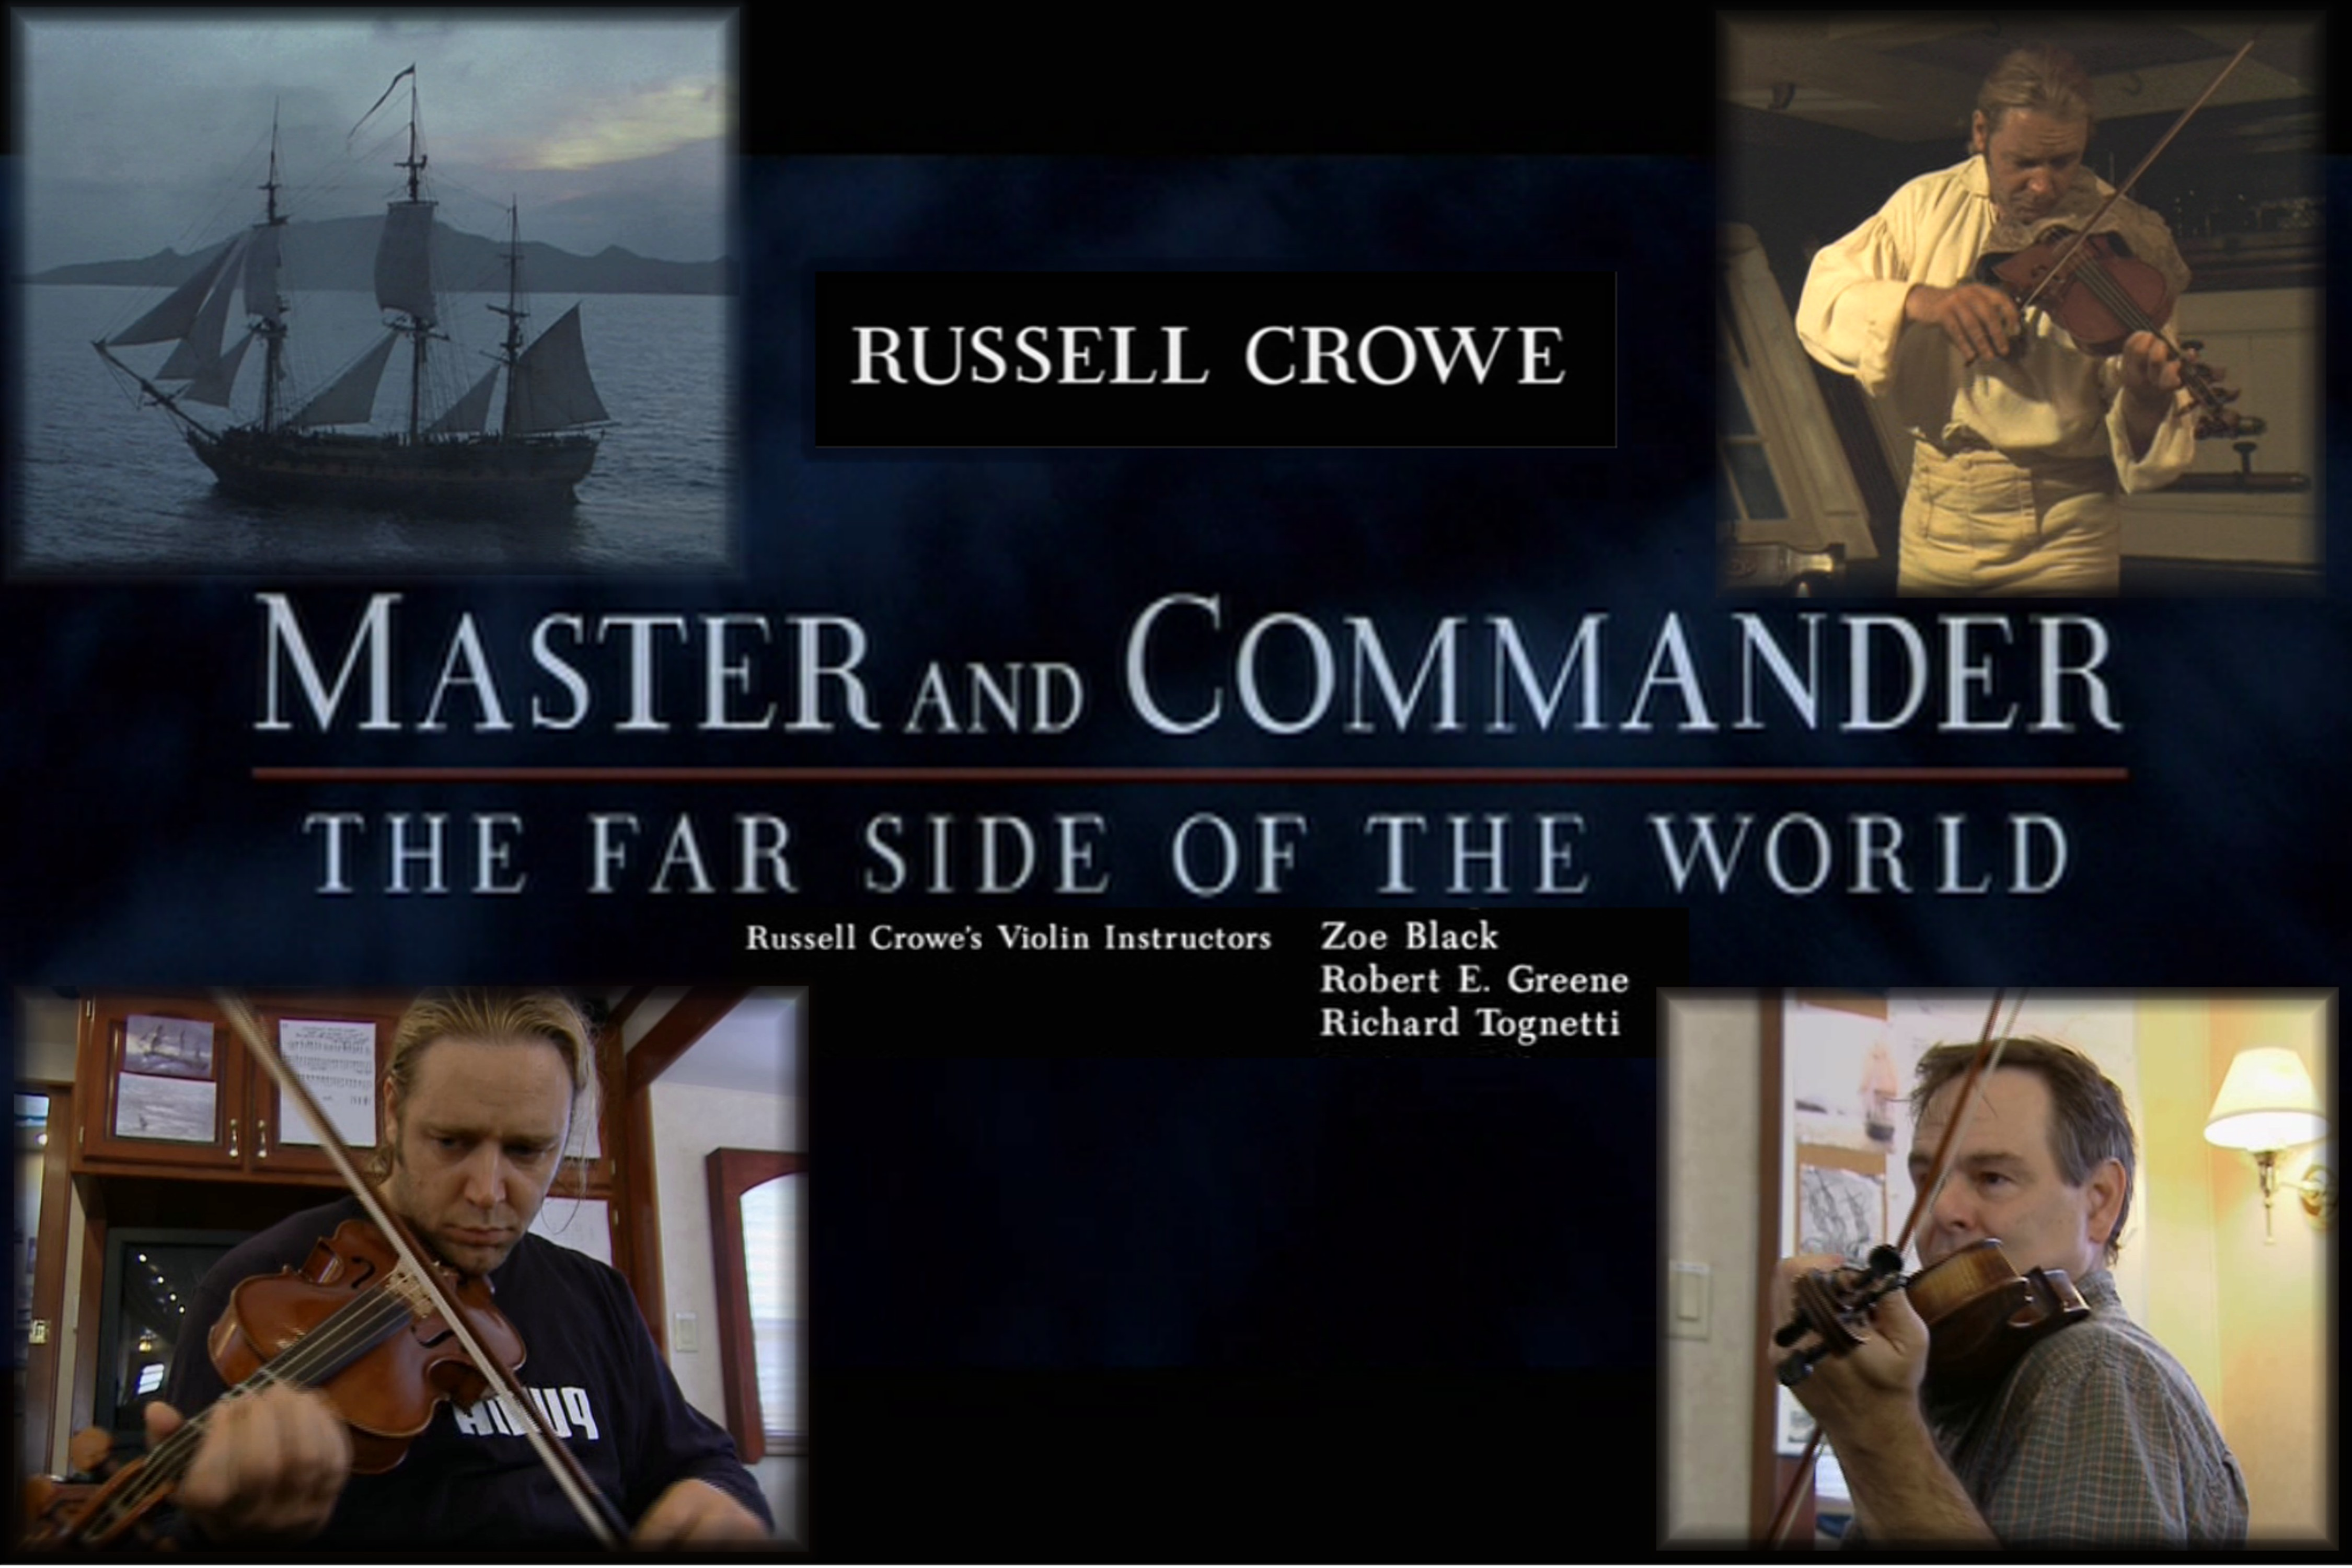 master and commander essay